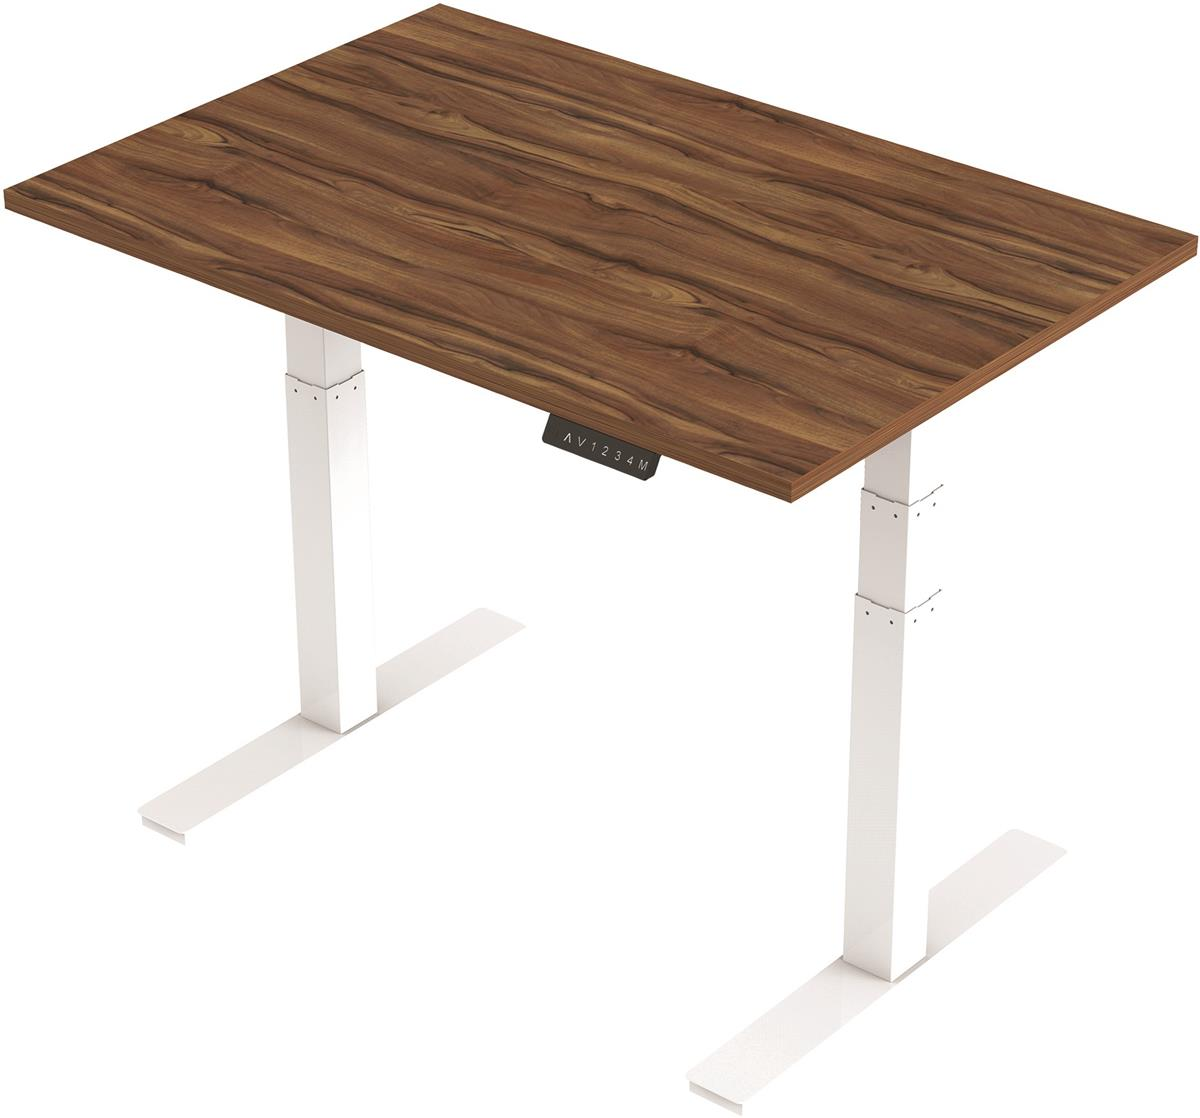 Image for Trexus Sit Stand Desk Height-adjustable White Leg Frame 1200mm Walnut